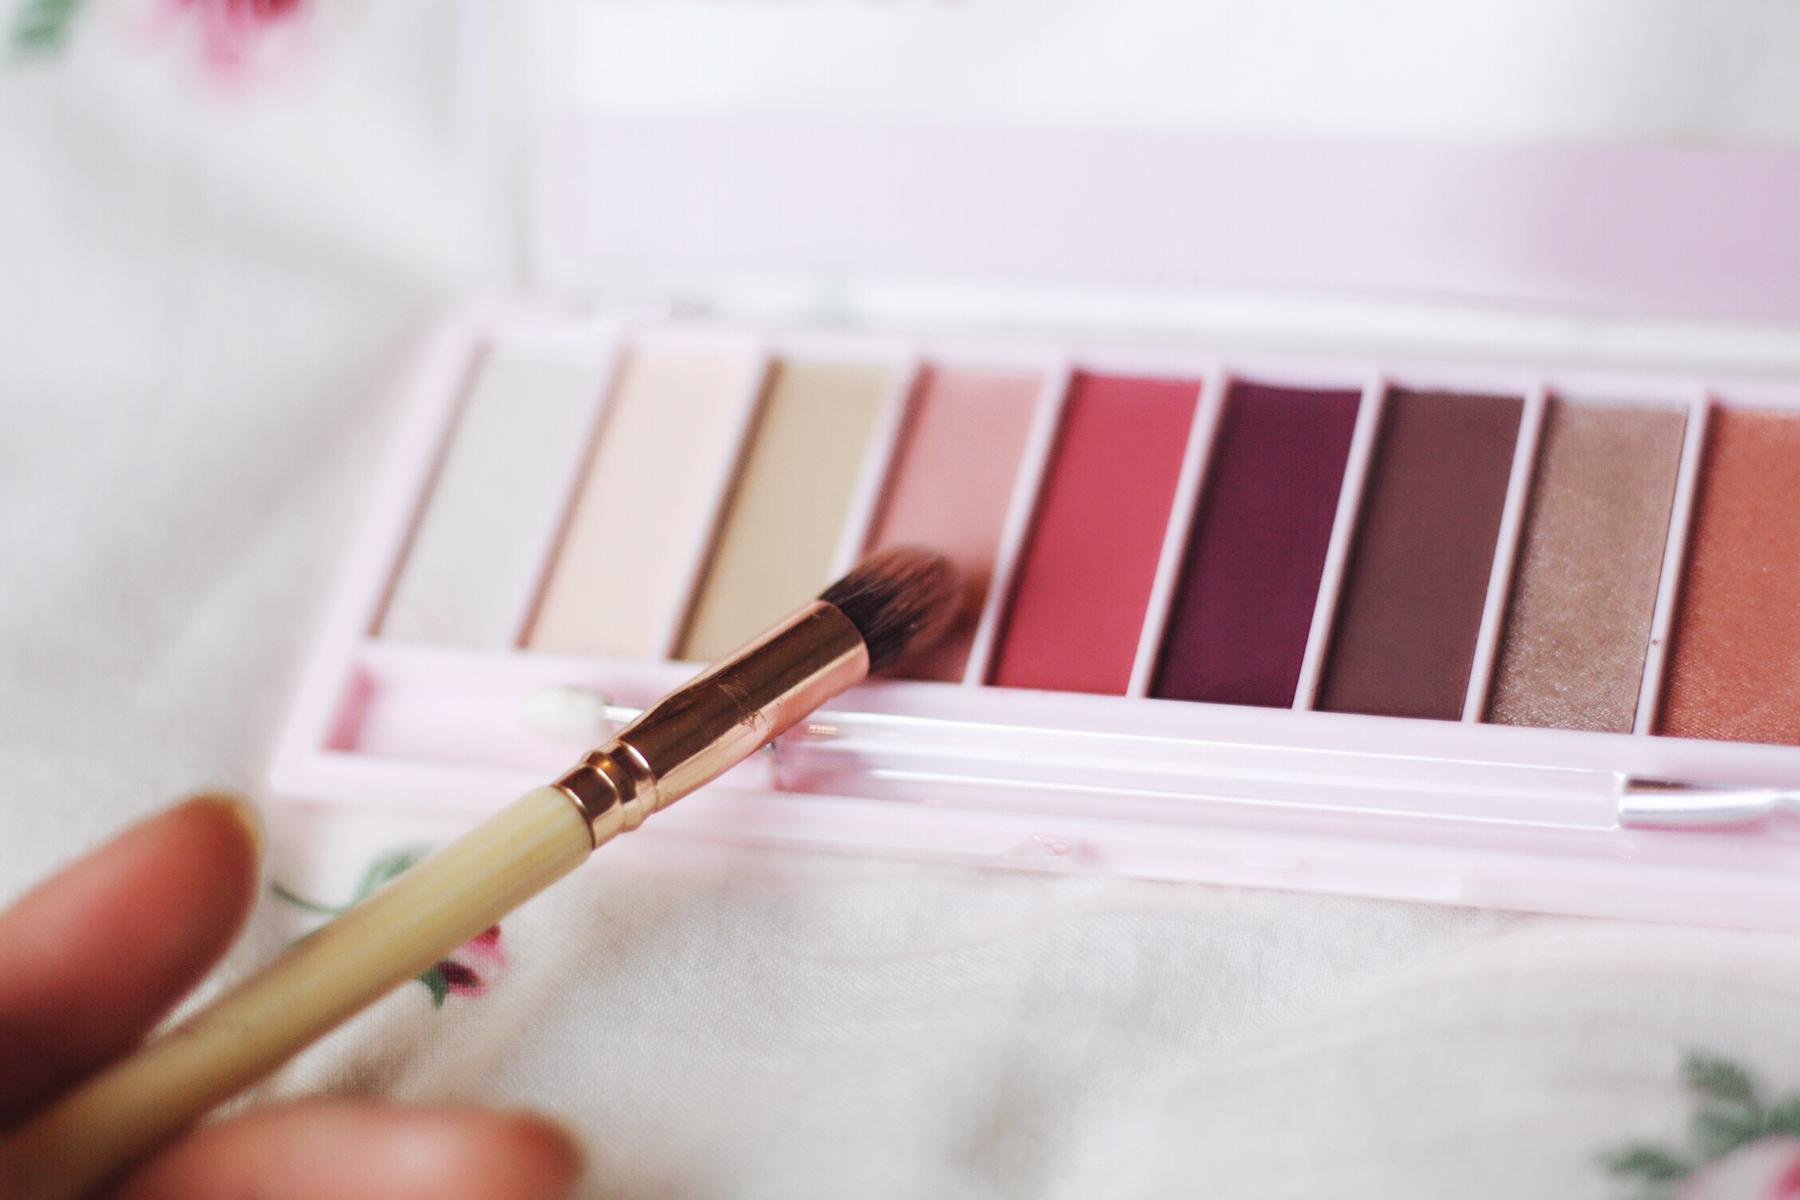 itsgoldie_rossmann_pink_rival_de_loop_tutorial_schminke_hannover_makeup_lidschatten_rosa